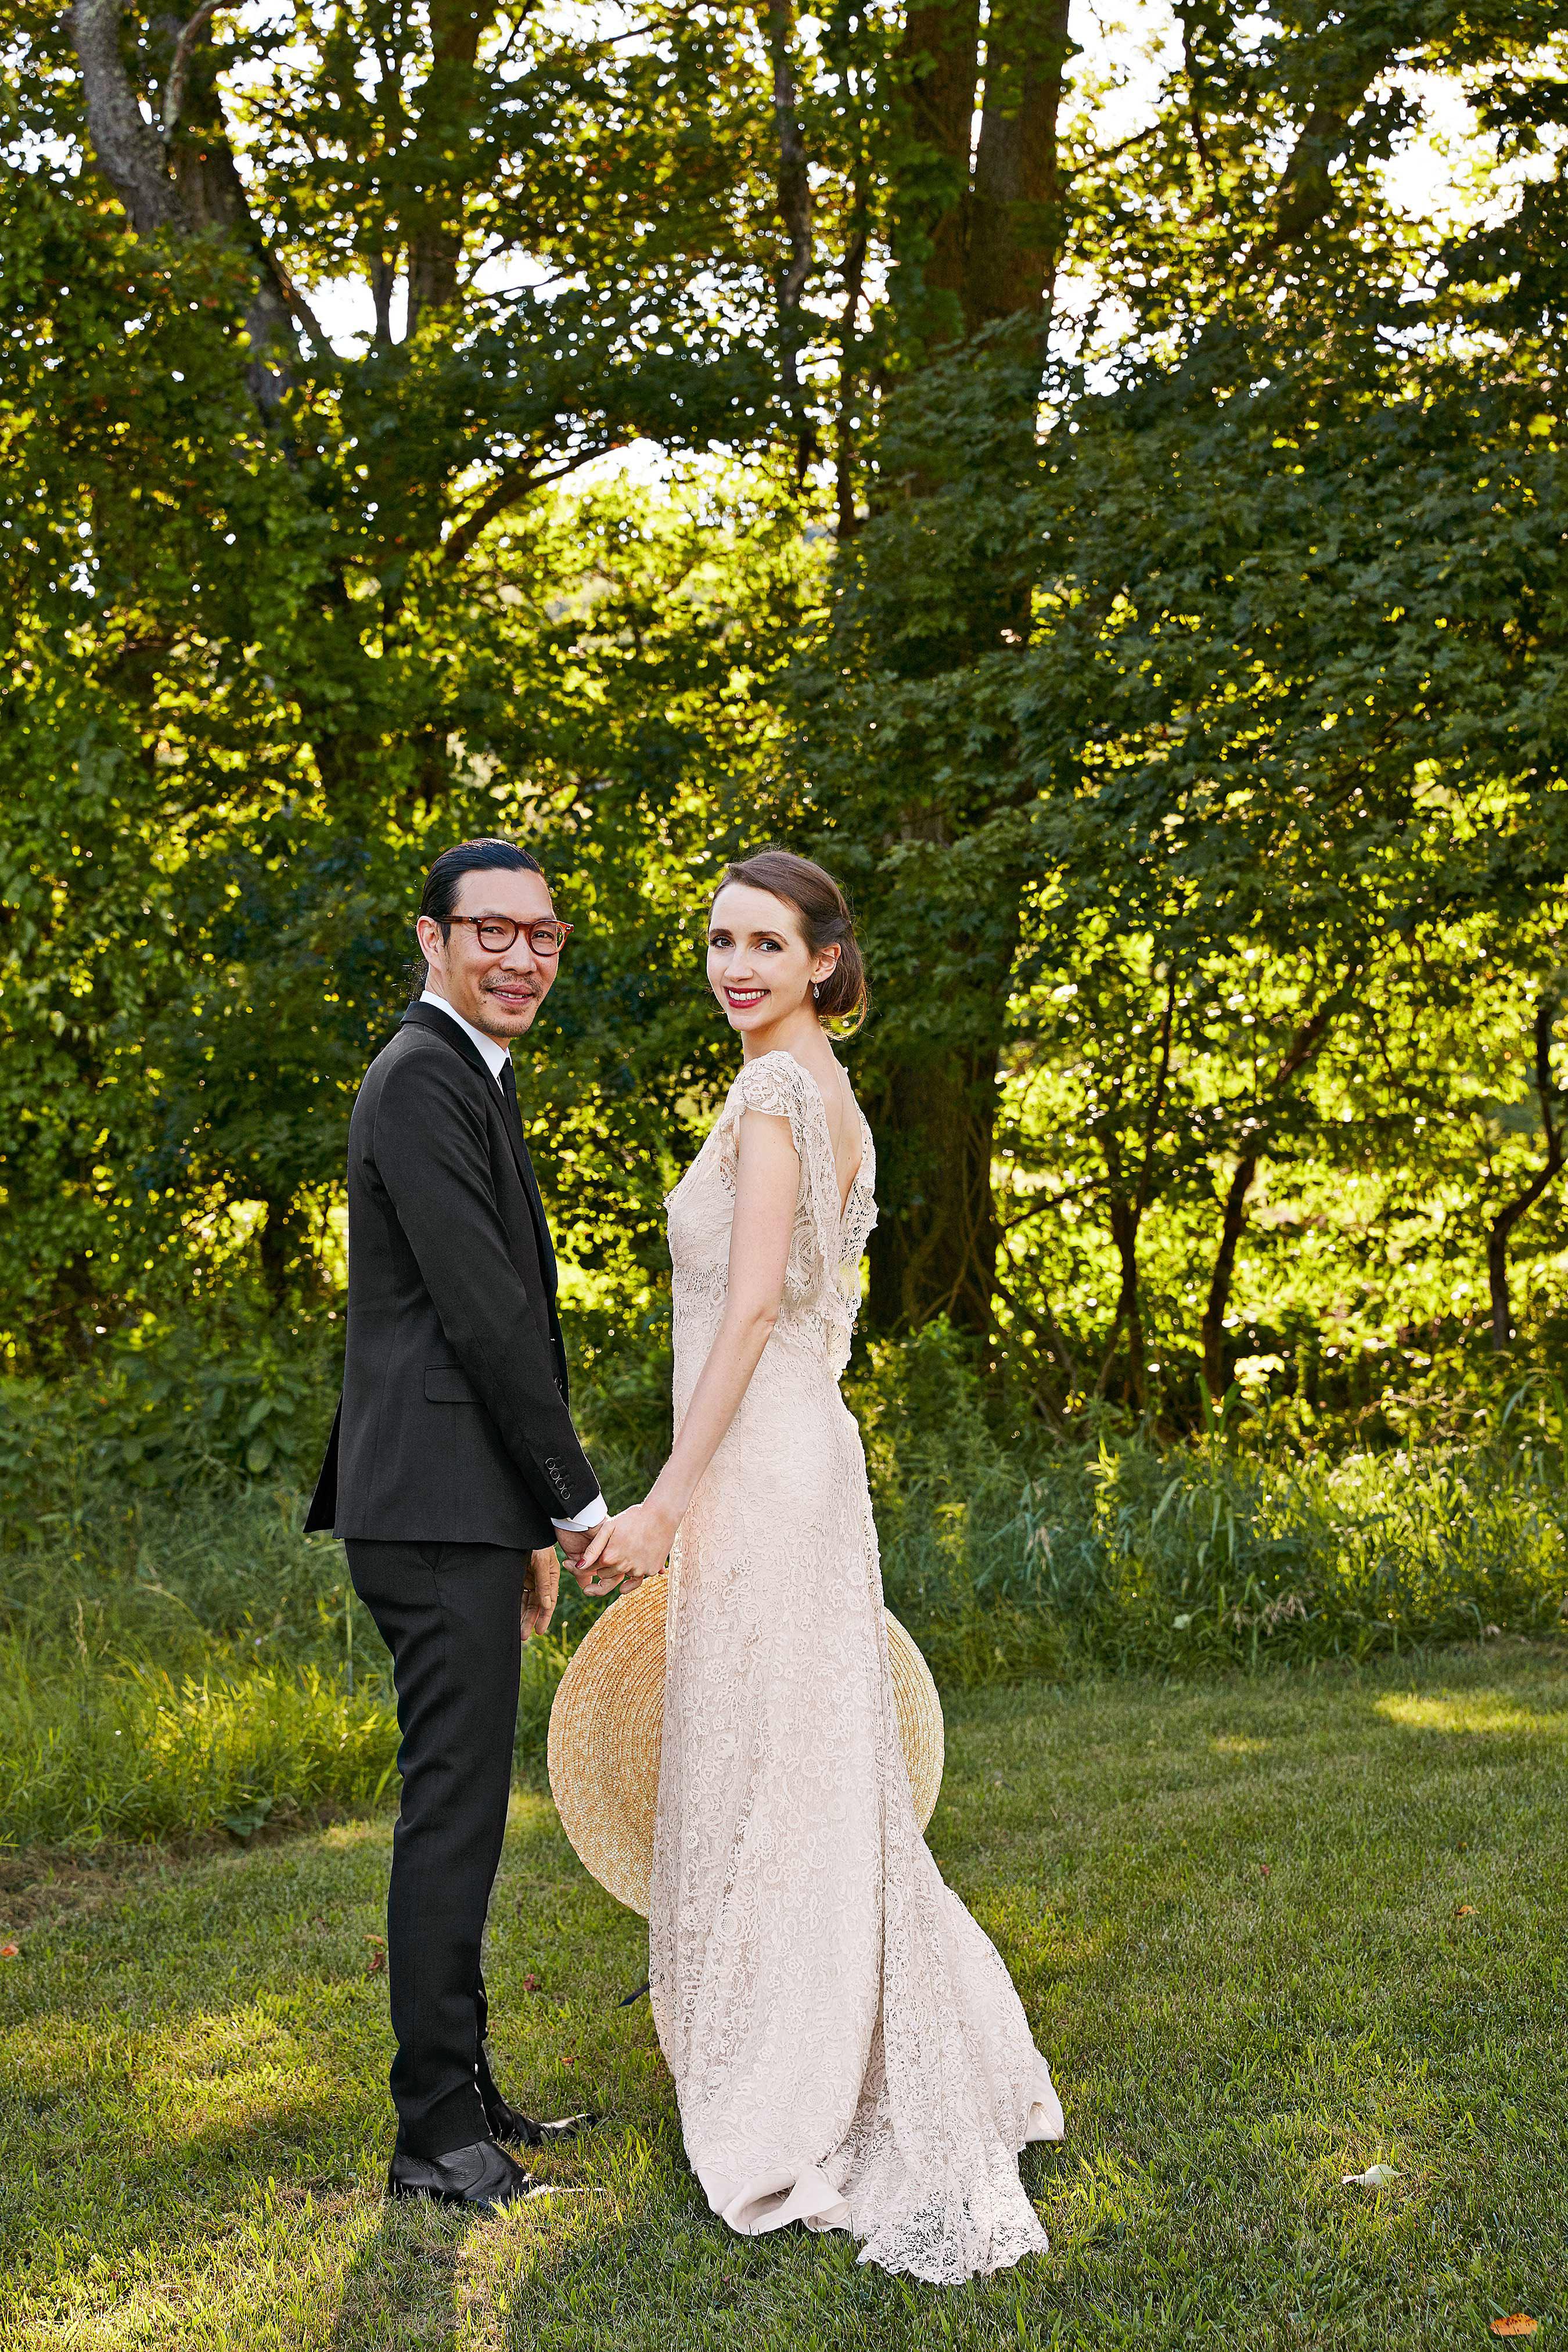 avril quy wedding new york couple trees green